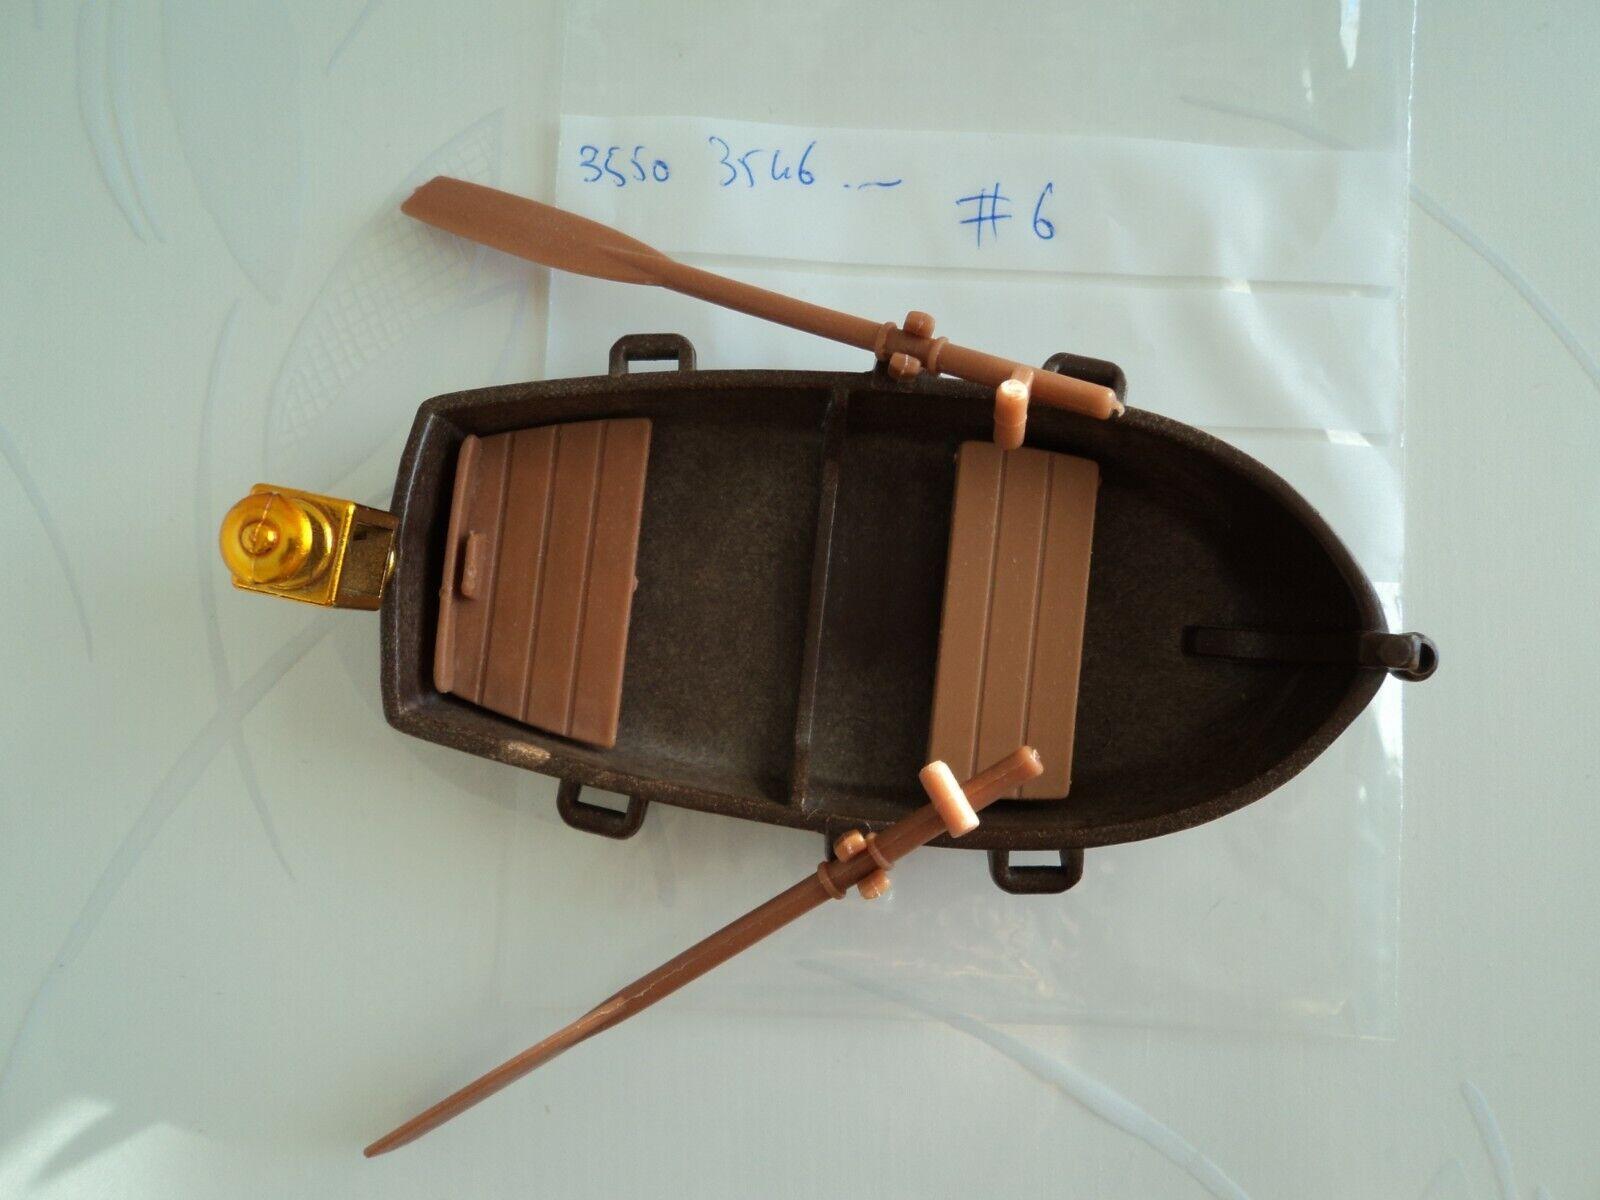 Playmobil vintage pirates barque canot marron bois lampe rames 3053 3550 3750 #6